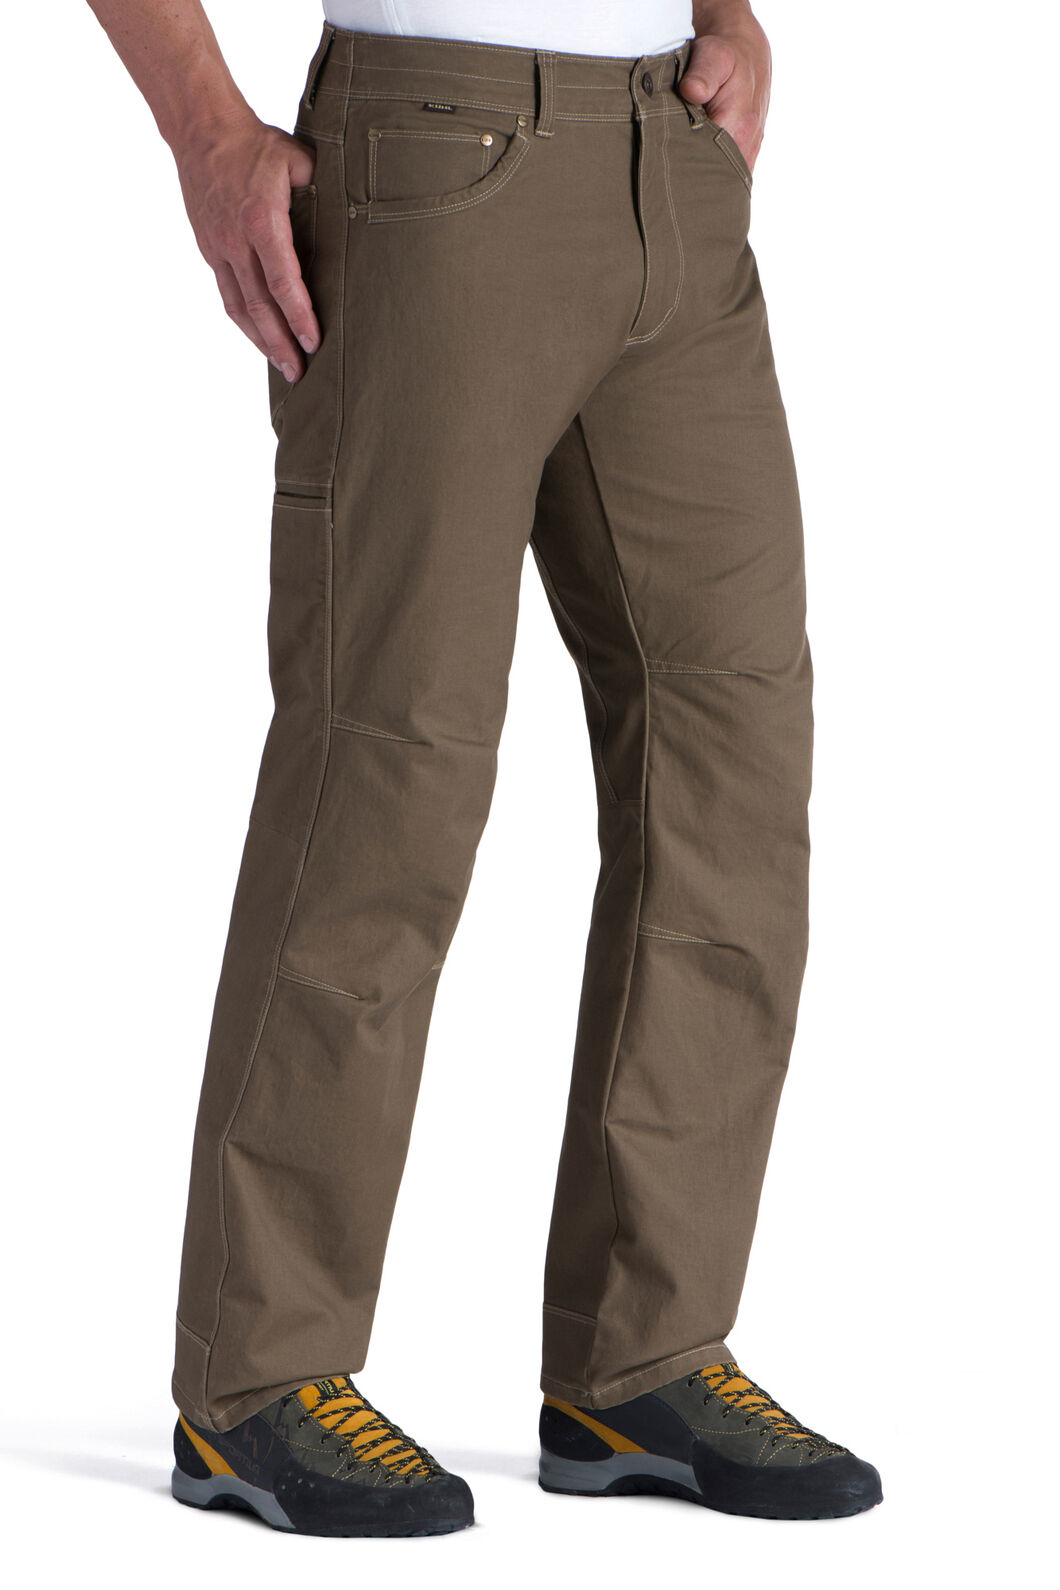 Kuhl Rydr Pants (32 inch leg) - Men's, Khaki, hi-res